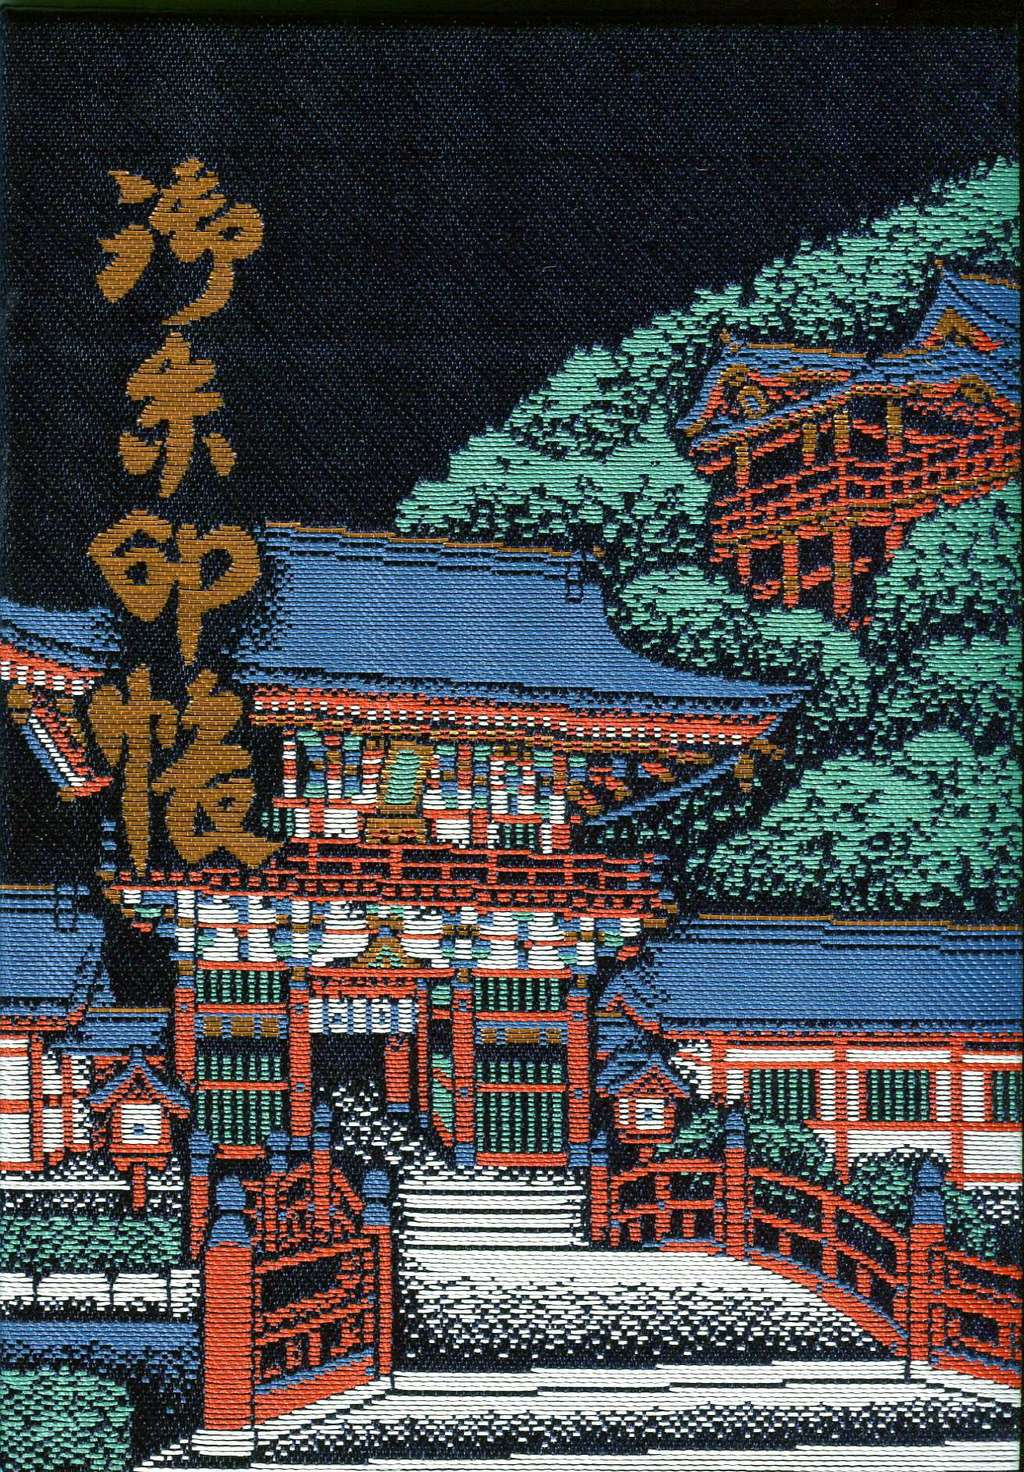 祐徳稲荷神社の御朱印帳